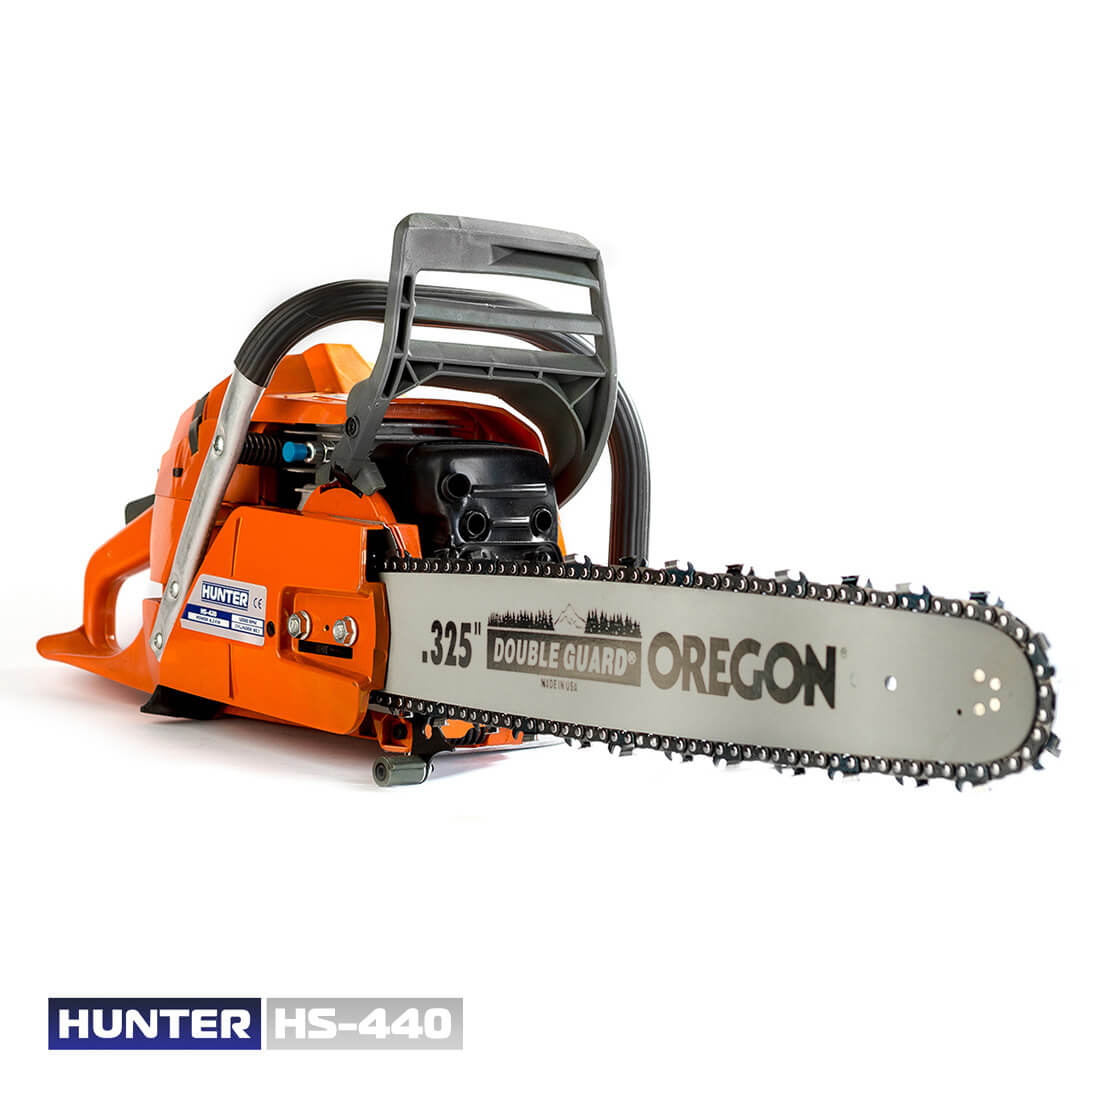 Фото Hunter HS-440 цена 7700грн №1 — Hunter